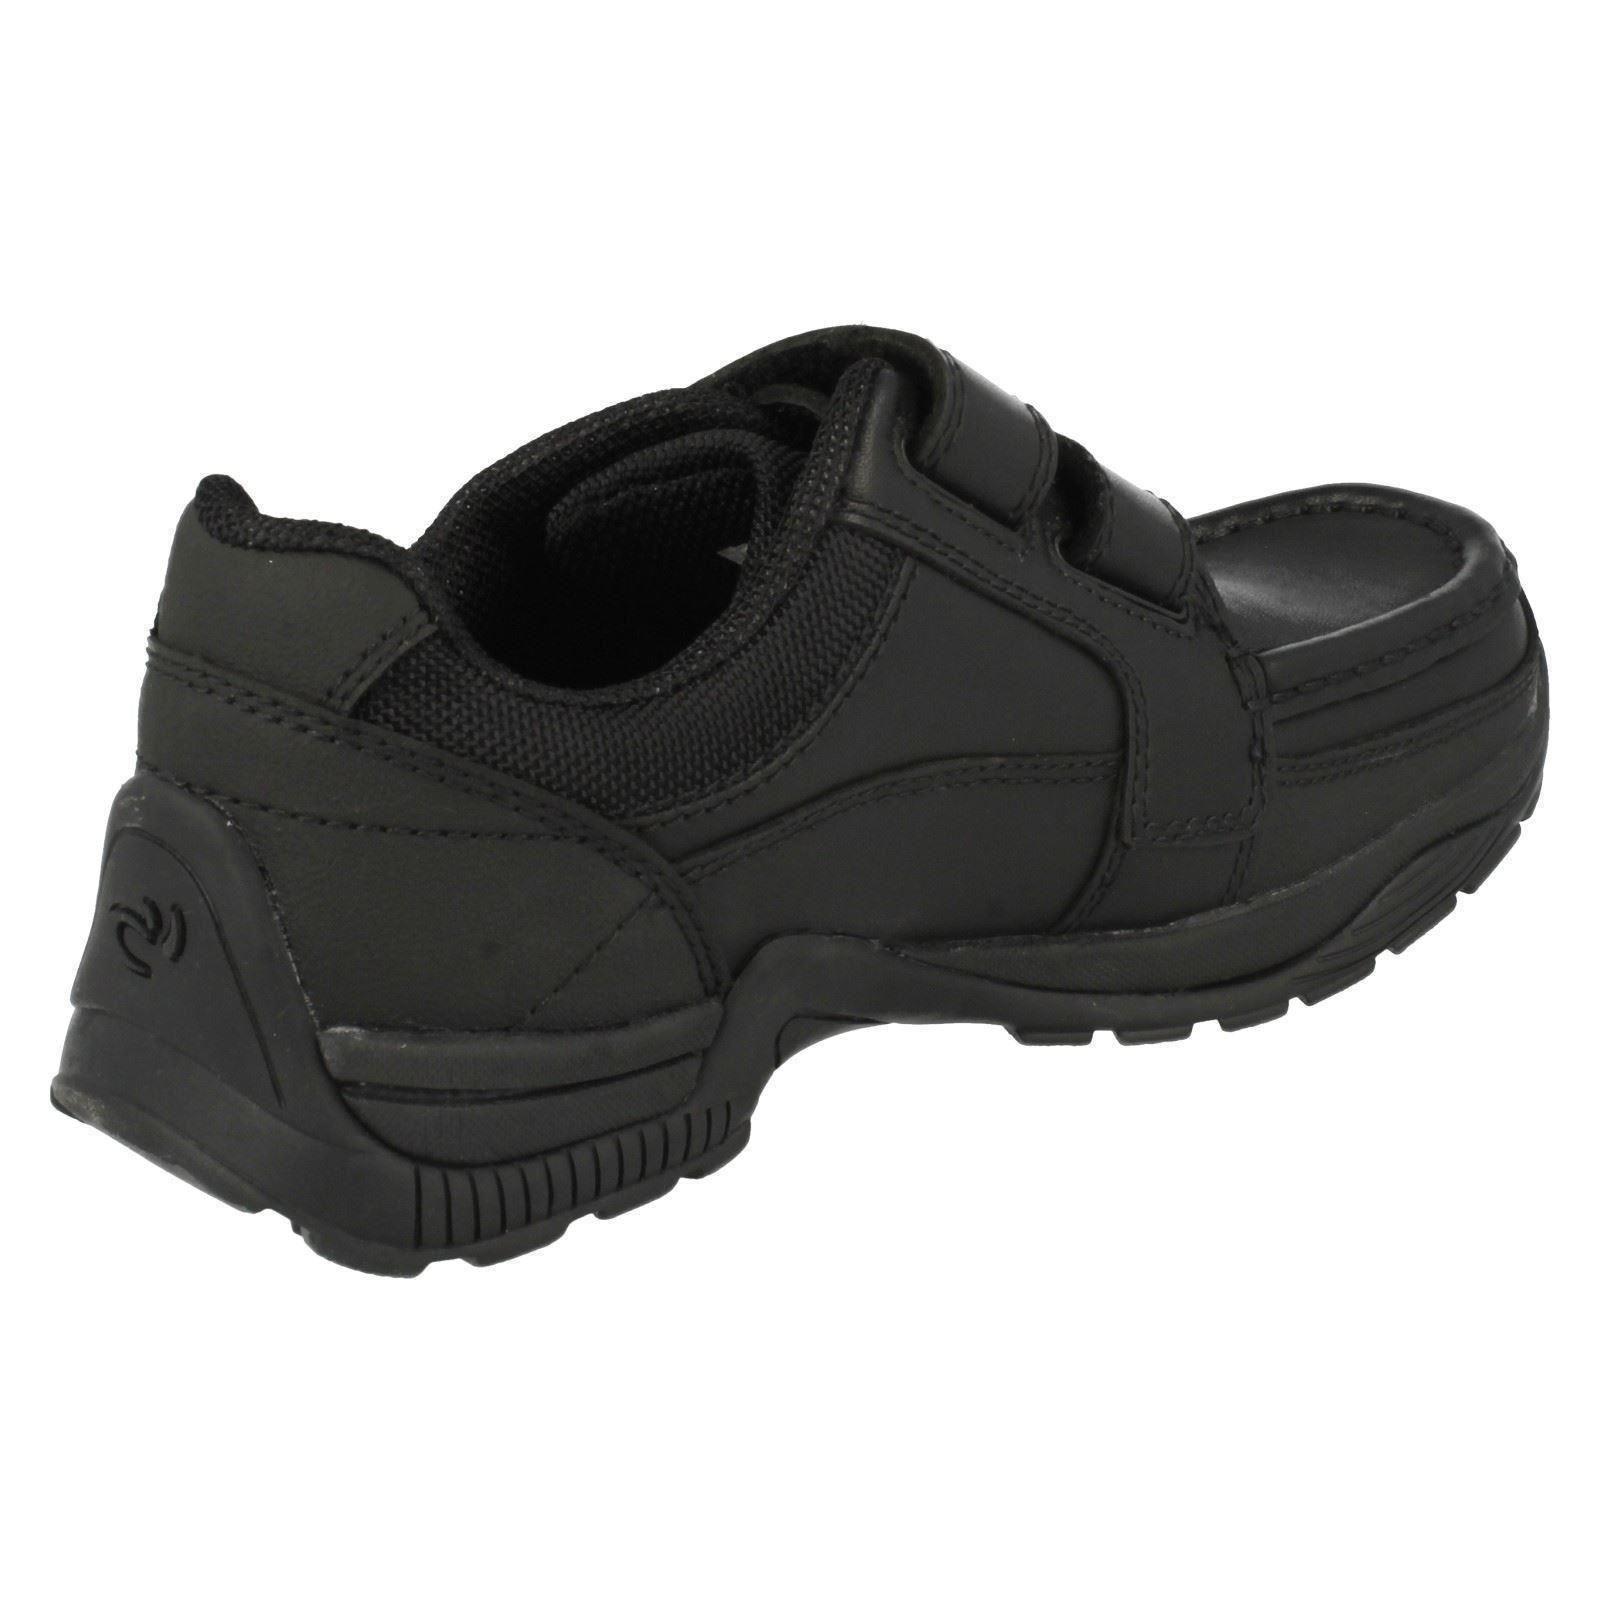 Senior Boys Rhino By Startrite Formal School Shoes Miles